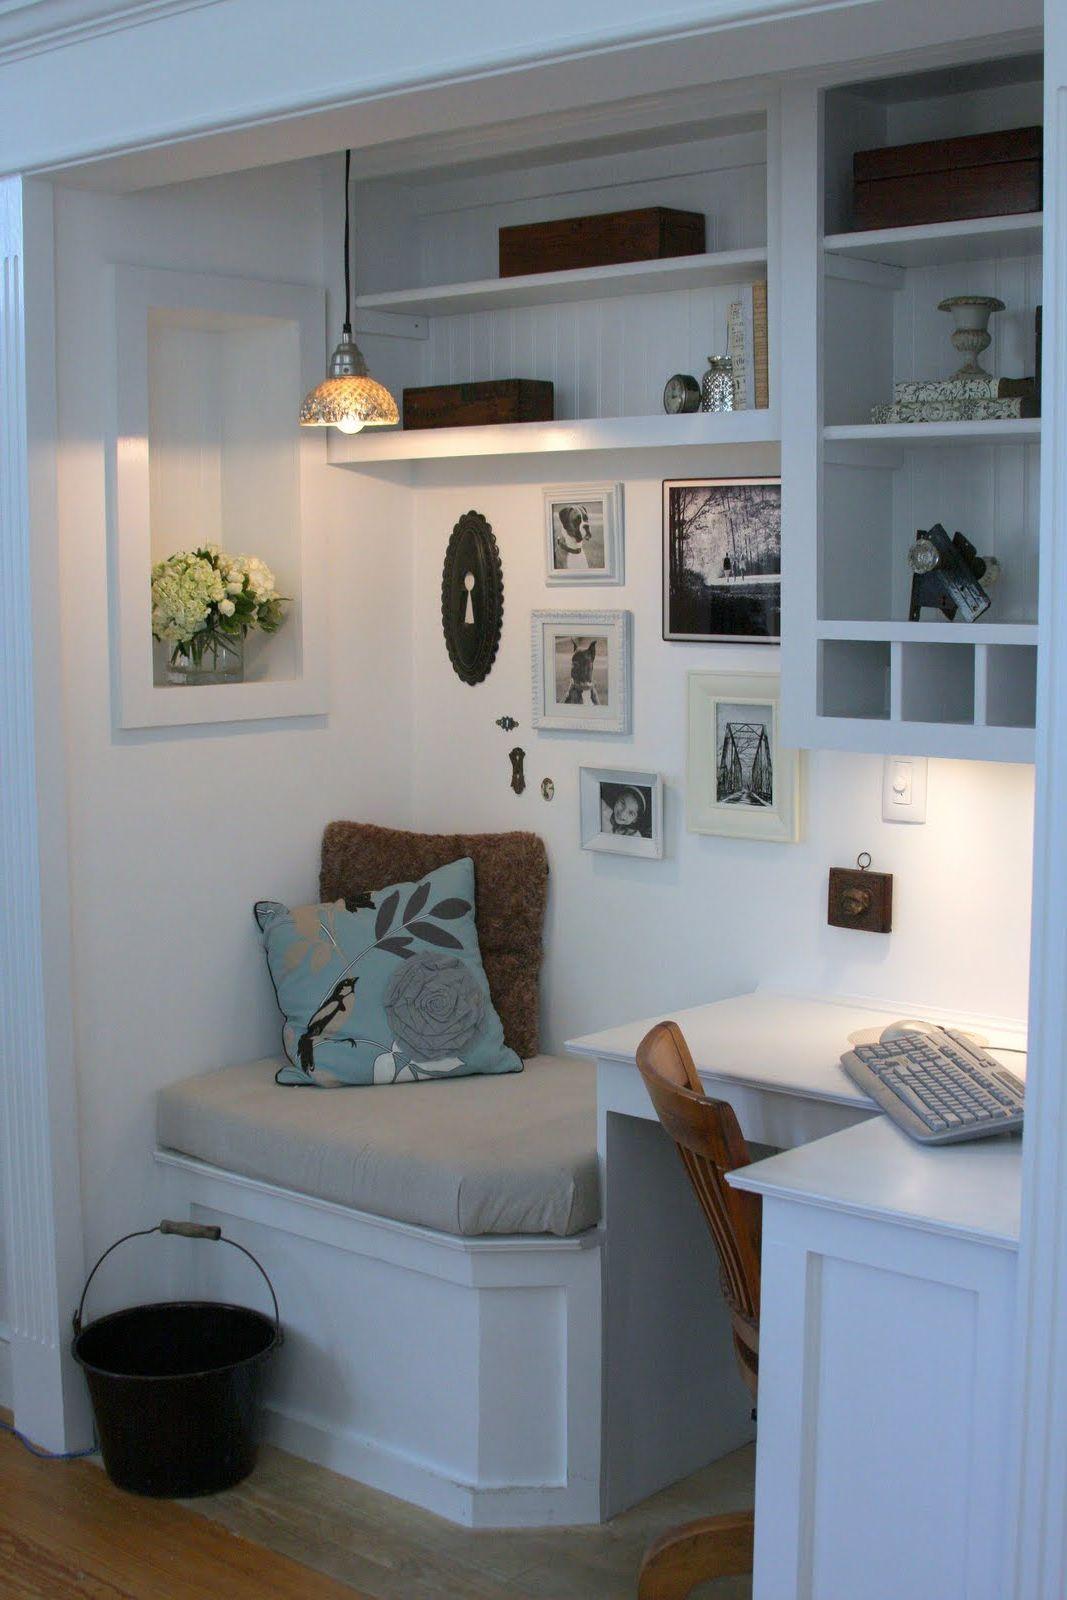 Window nook ideas  small home offiice placed in hidden window nook idea  inspiring